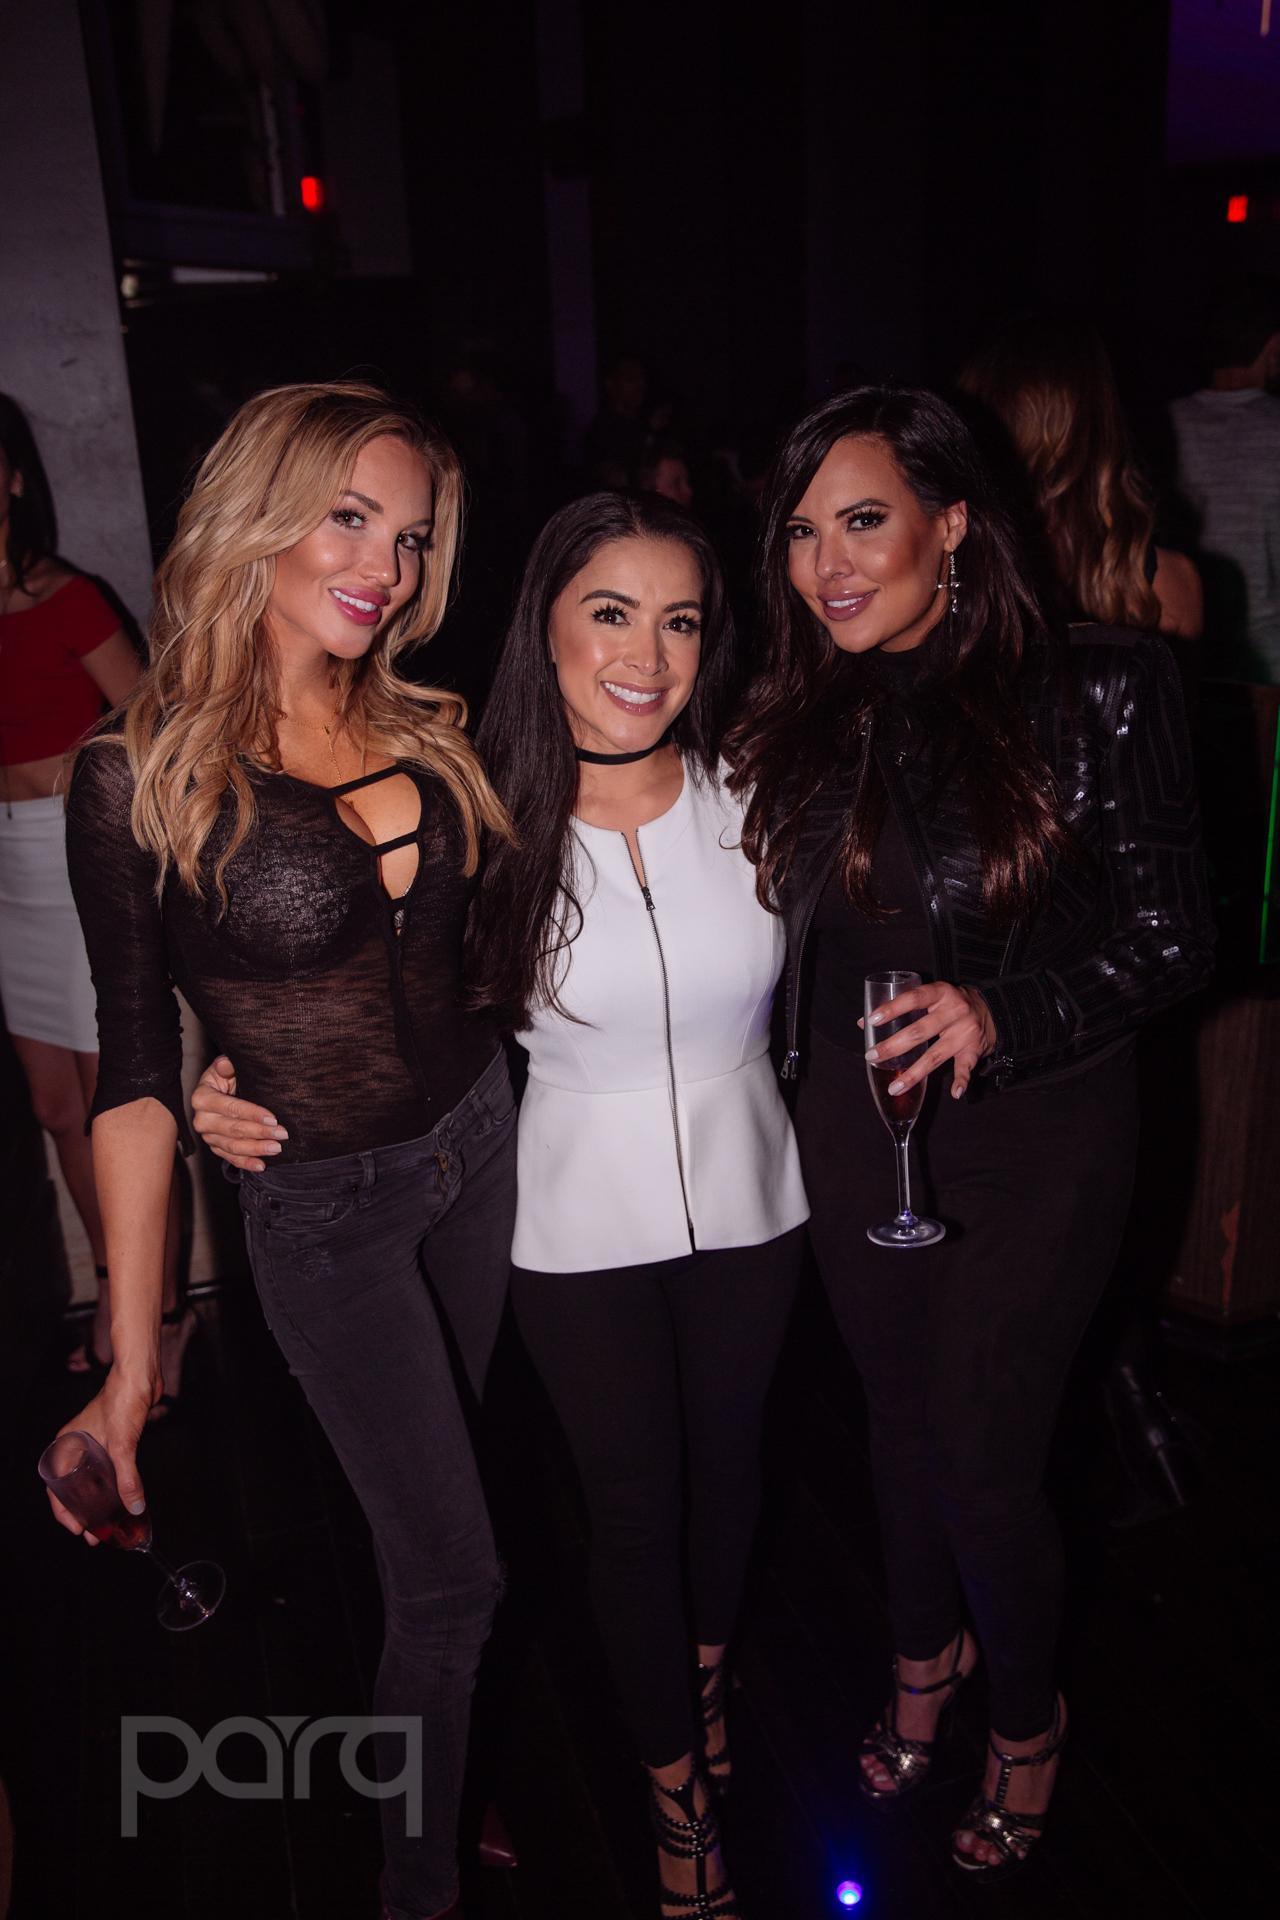 San-Diego-Nightclub-Zoo Funktion-24.jpg